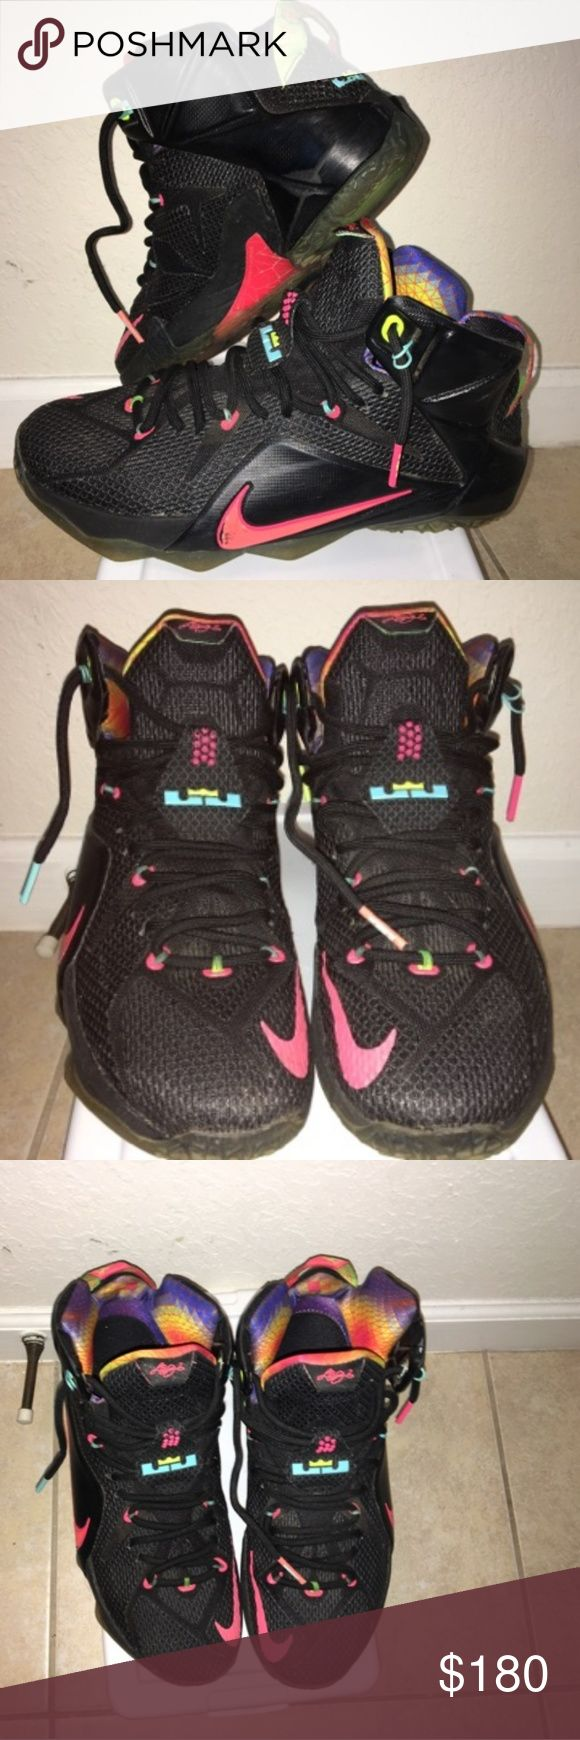 "LeBron James sneakers Pre-own worn ONCE! Lebron James 12 ""Black Bright Mango Hyper Punch"" Size U.S. : 9.5. LeBron James Shoes Sneakers"